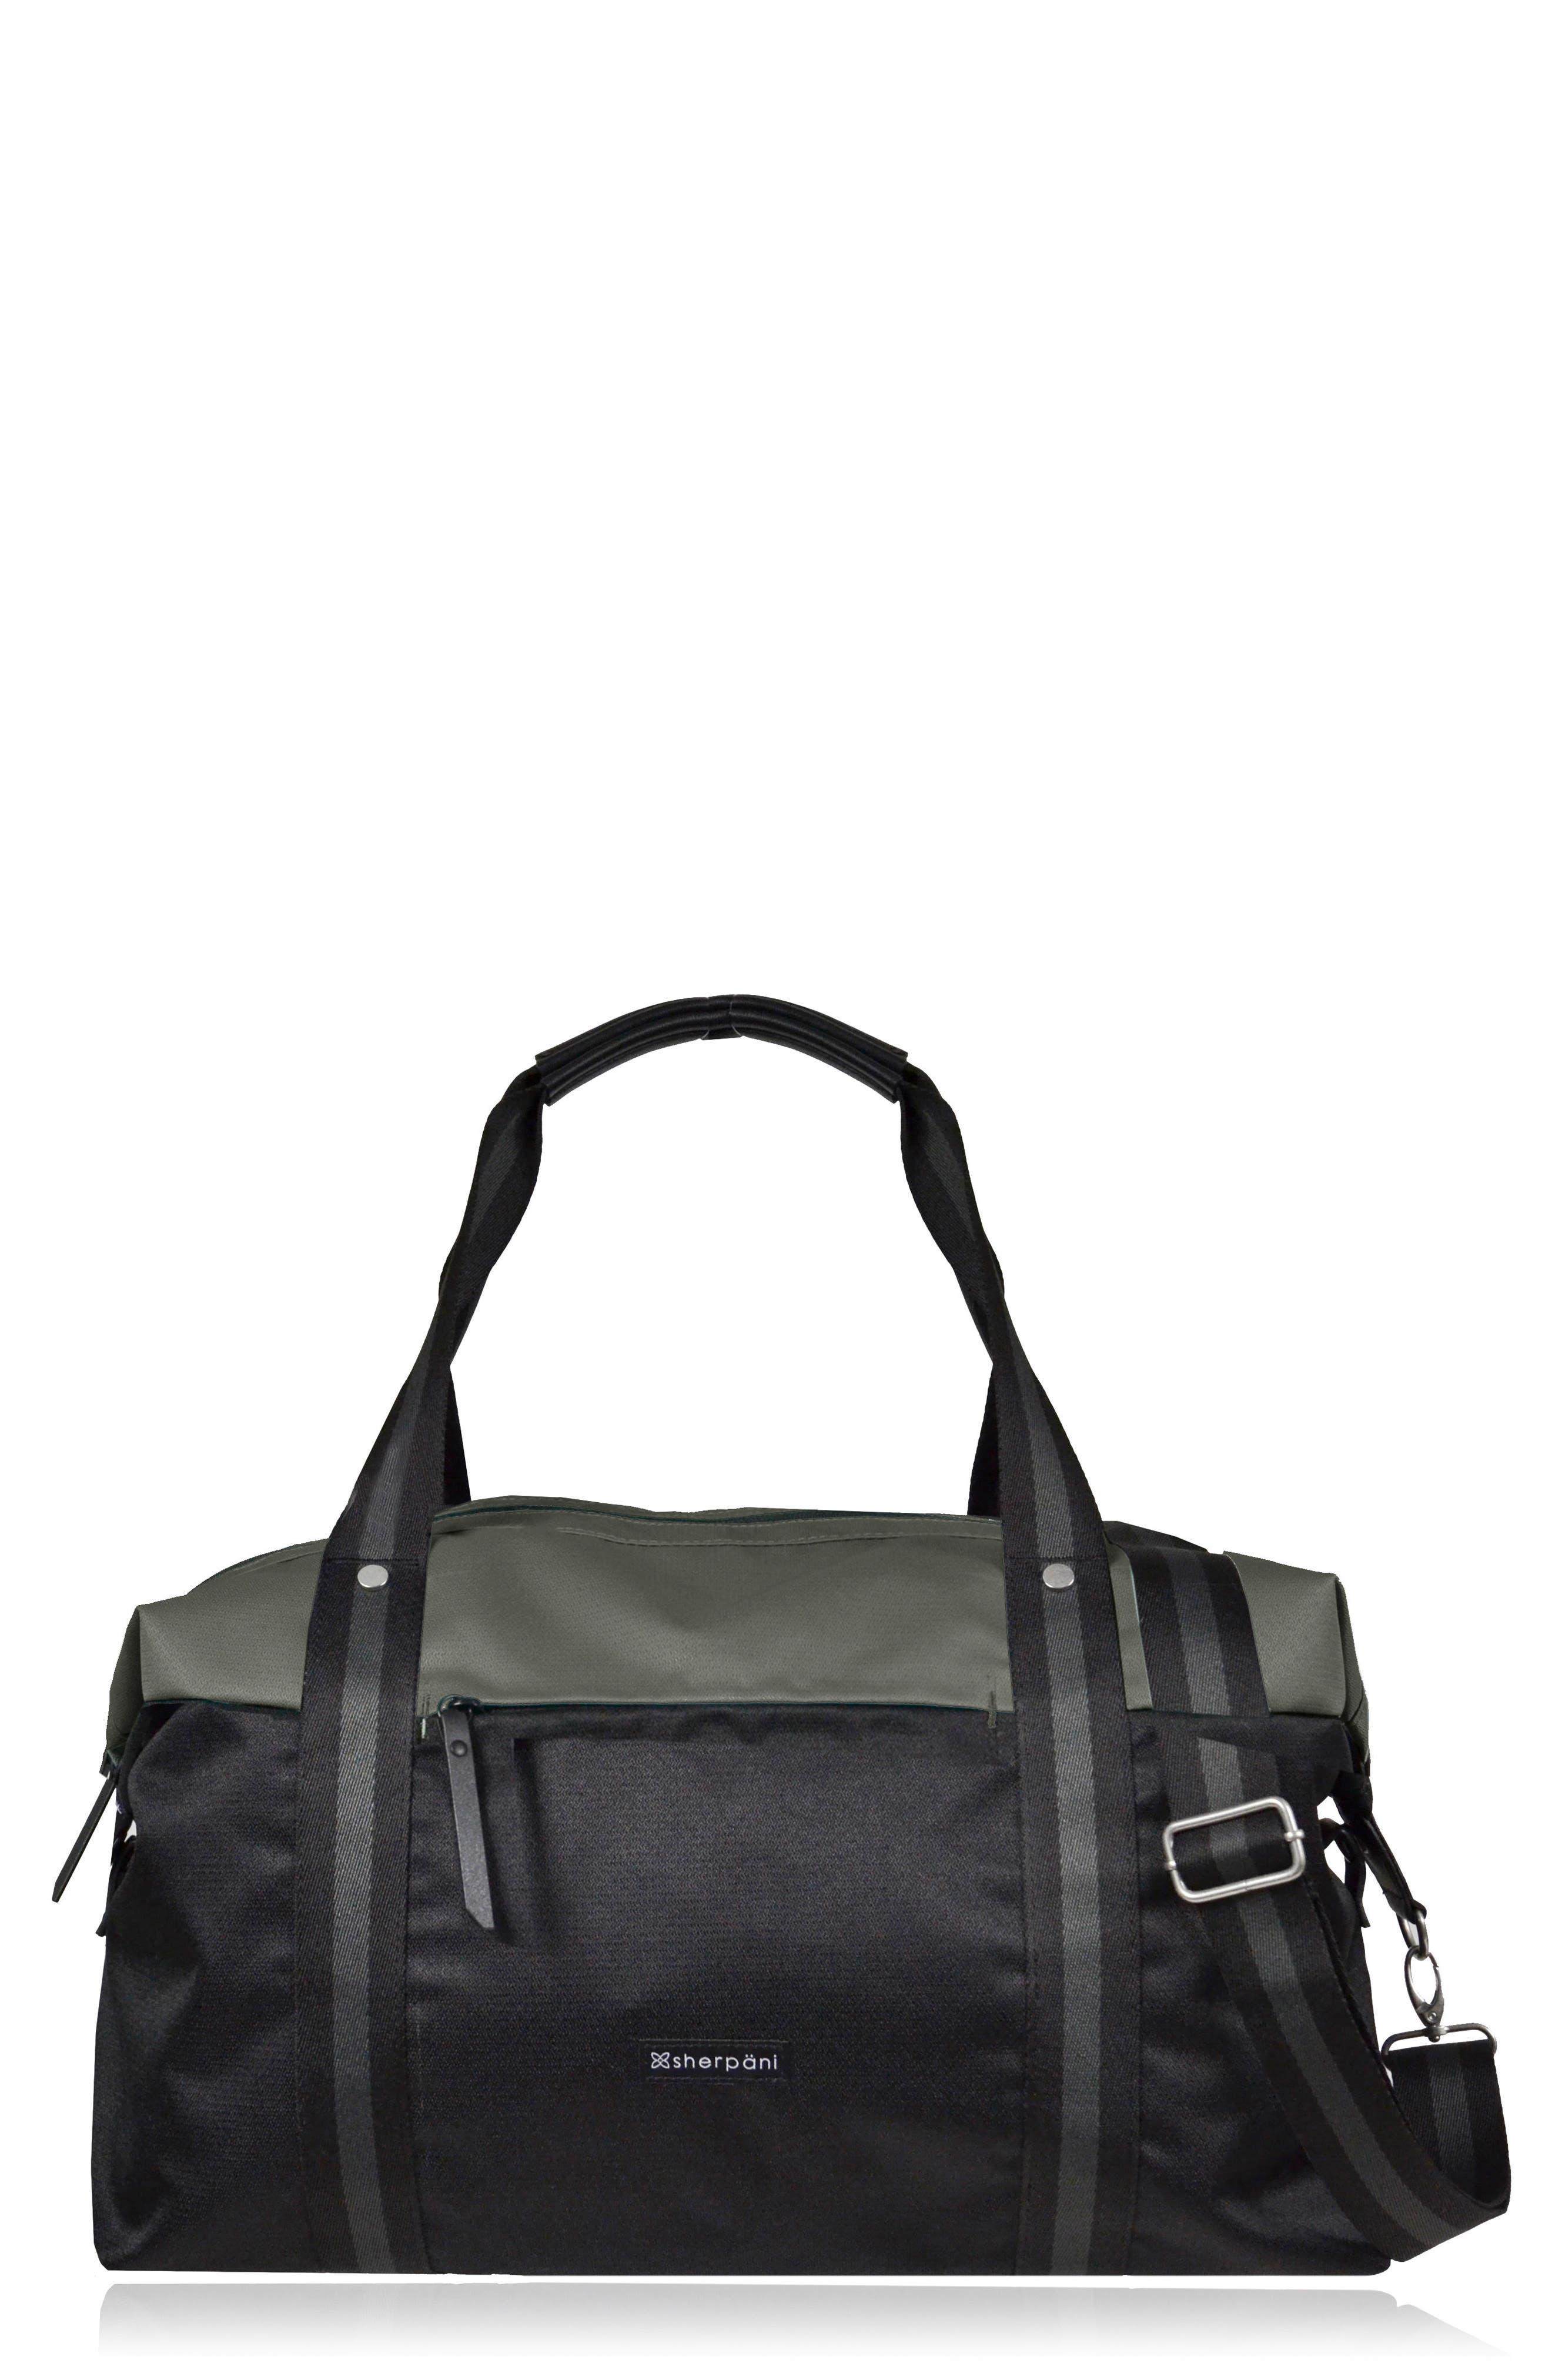 Main Image - Sherpani Finn Overnighter Duffel Bag